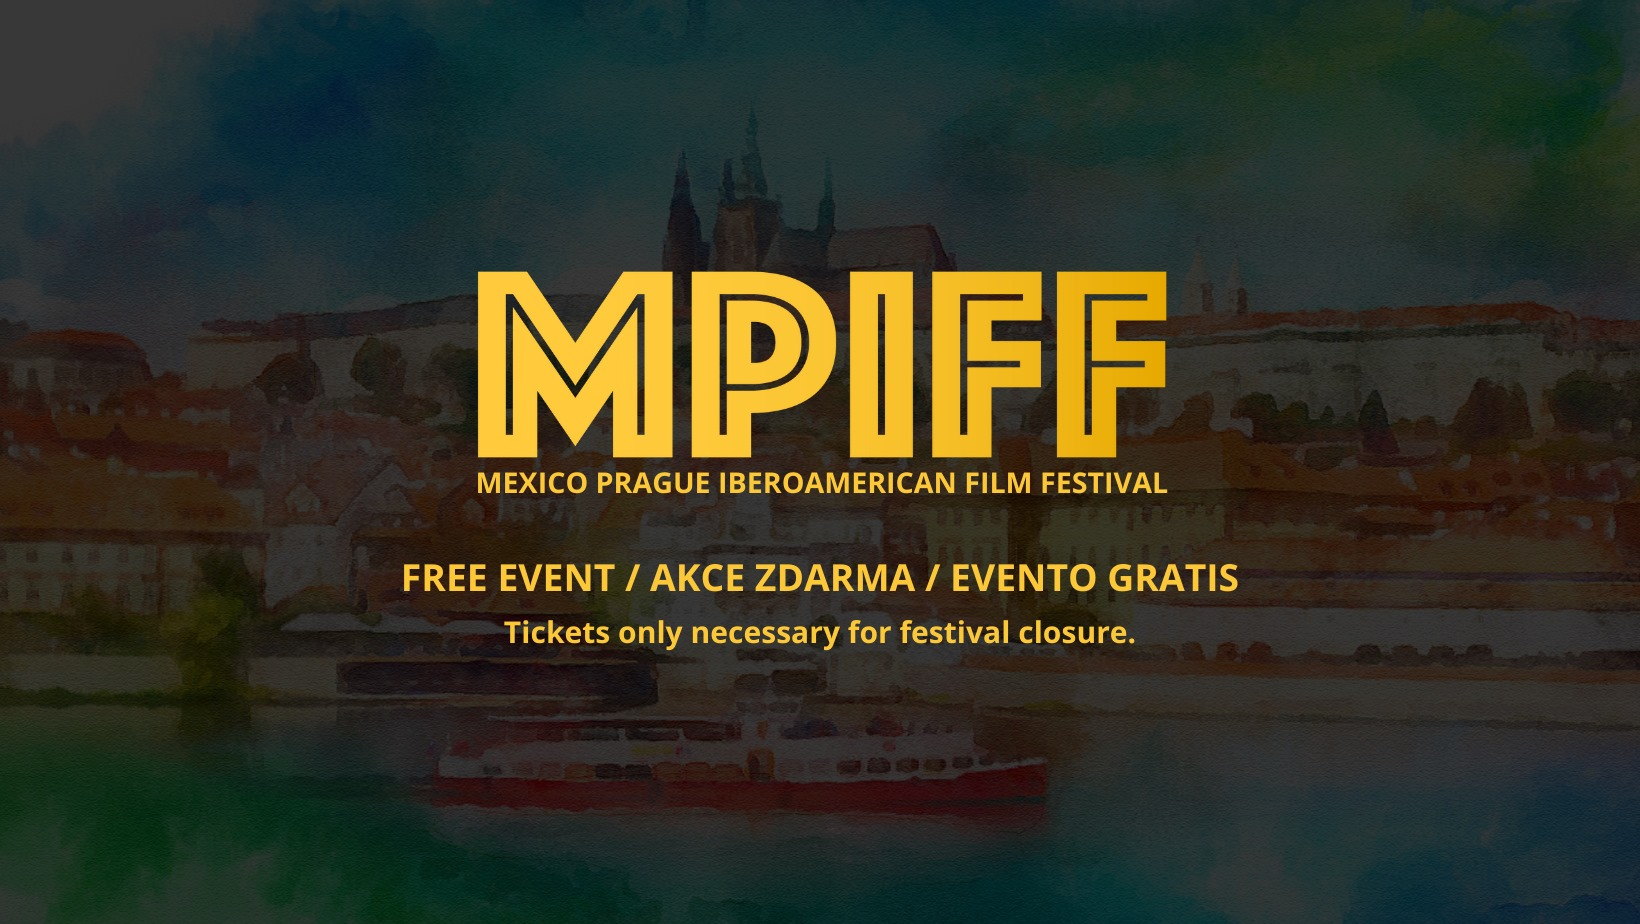 Mexico Prague Iberoamerican Film Festival